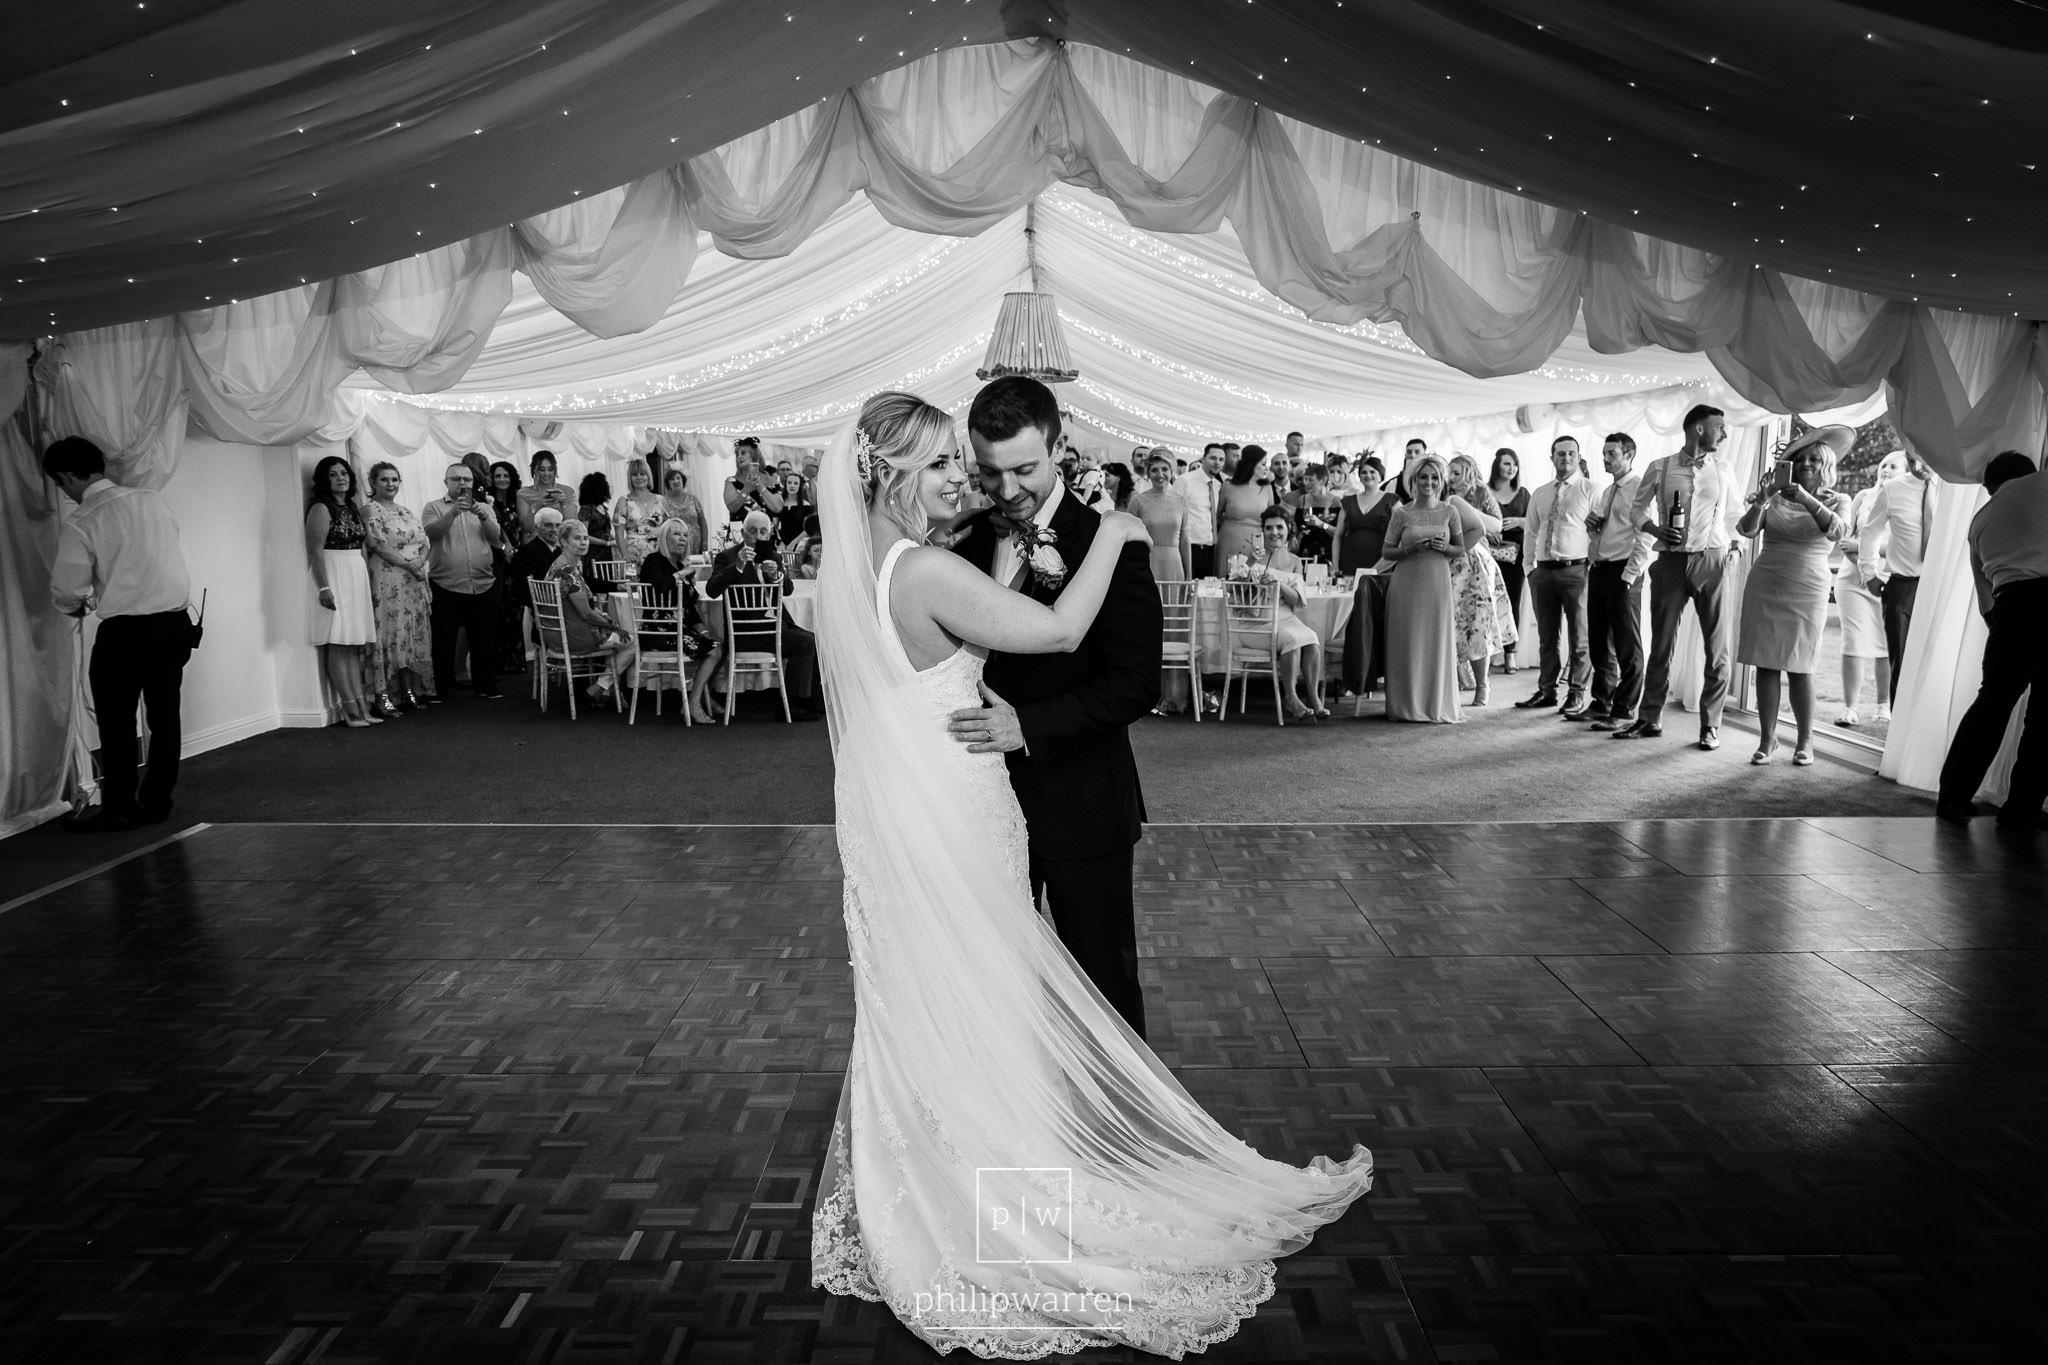 wedding photos at llanerch vineyard rachel + craig-13.jpg